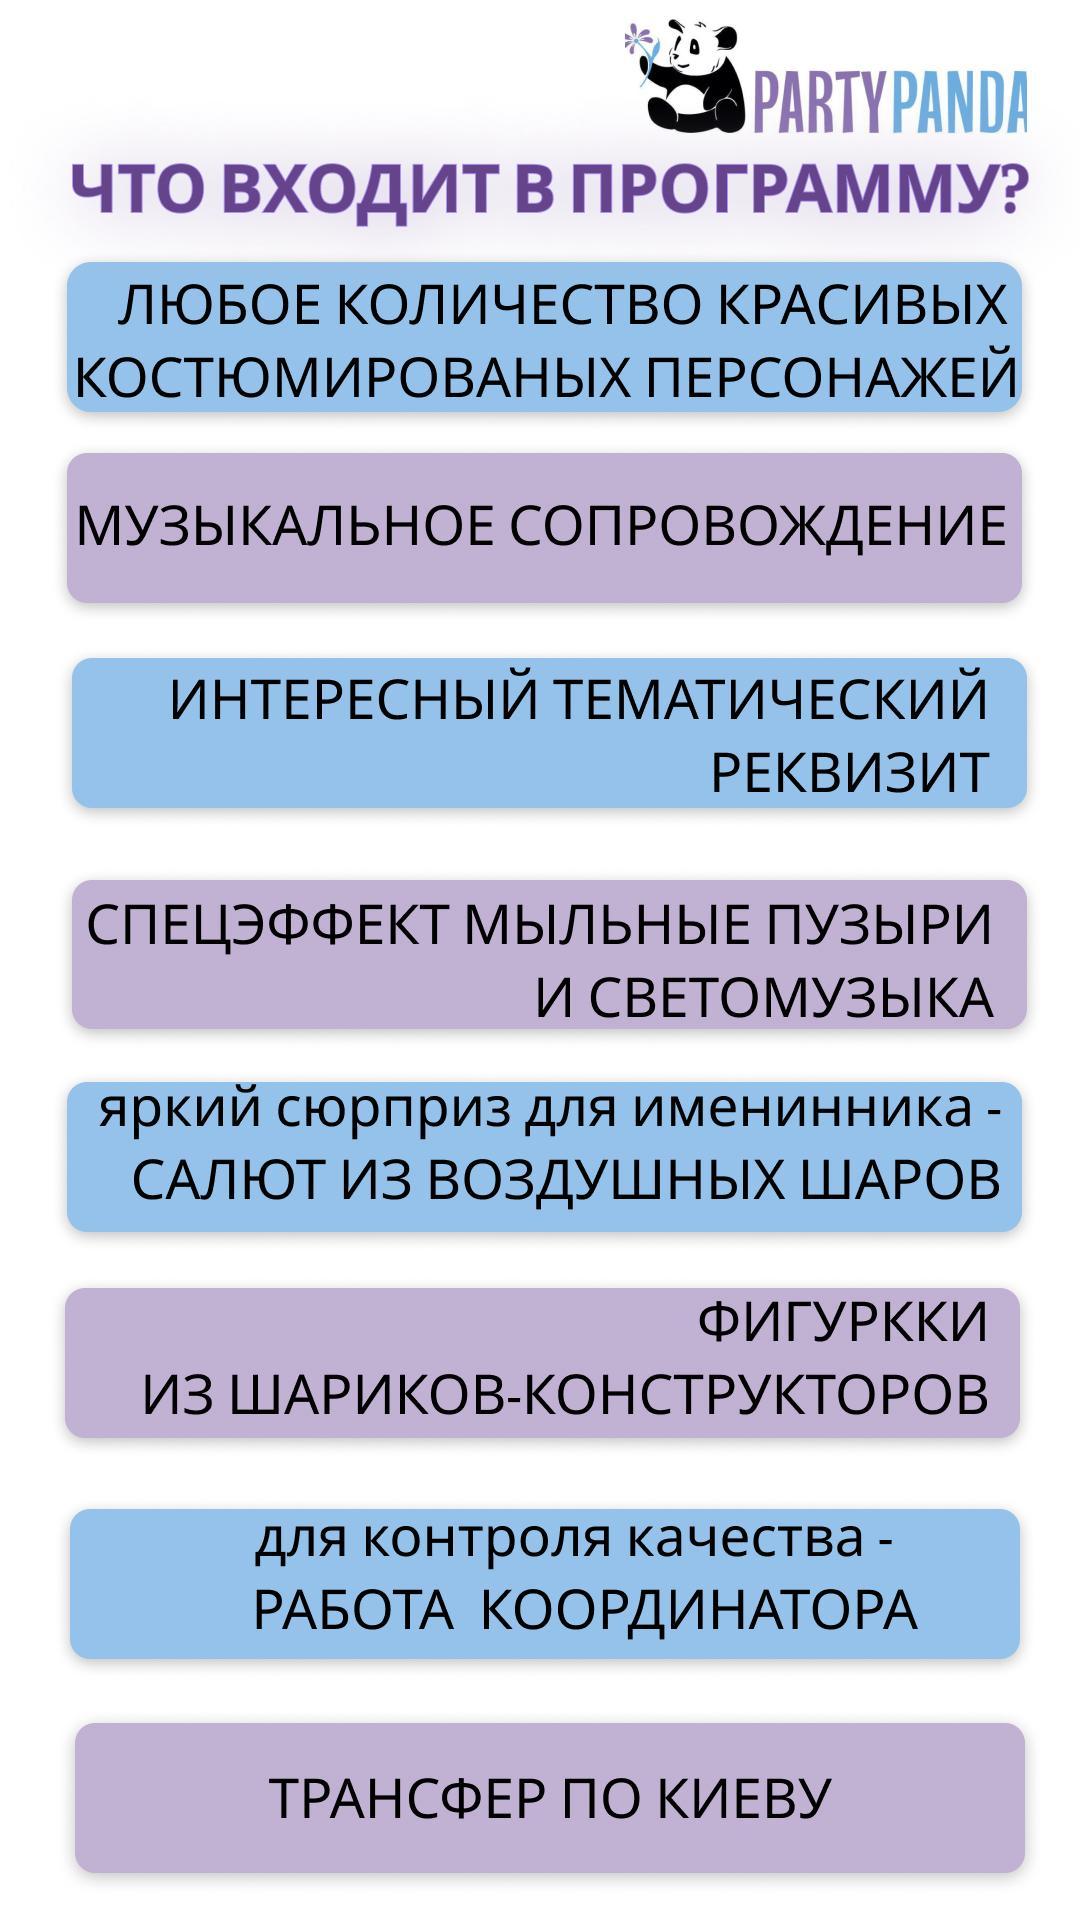 Аниматоры Киев